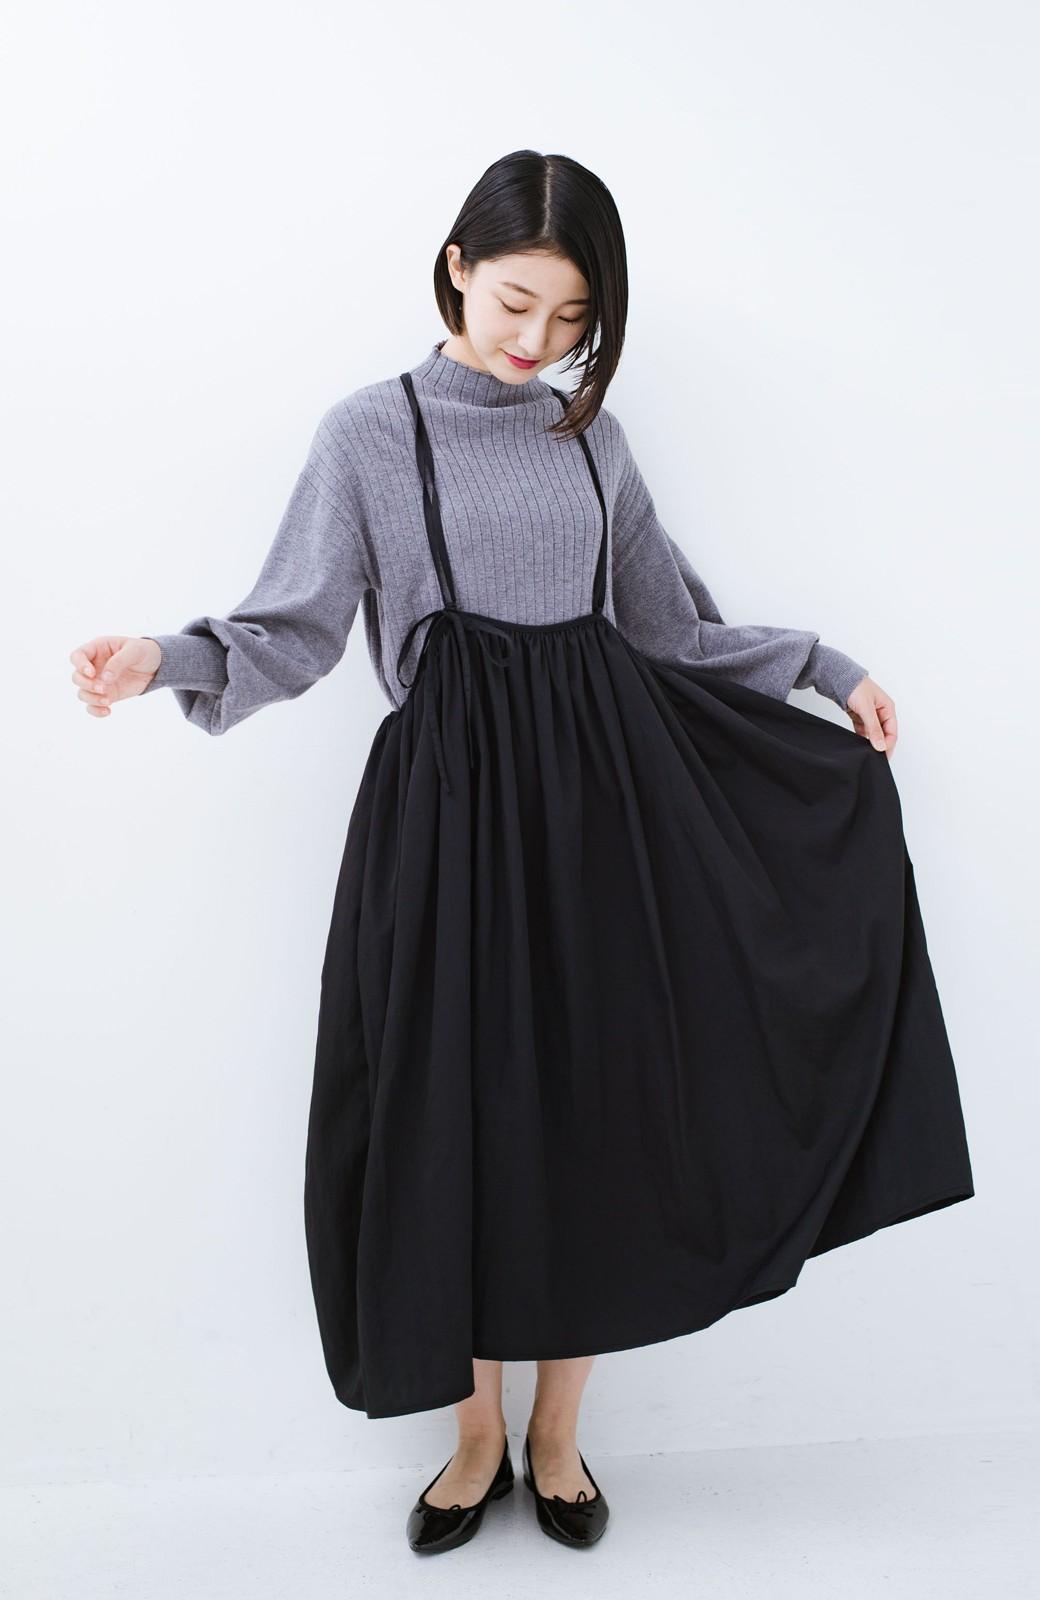 haco! 女の子バンザイ!プロジェクト【ブルー期】 ニットですら重ね着できる安心さ ゆったりギャザーキャミワンピ <ブラック>の商品写真5